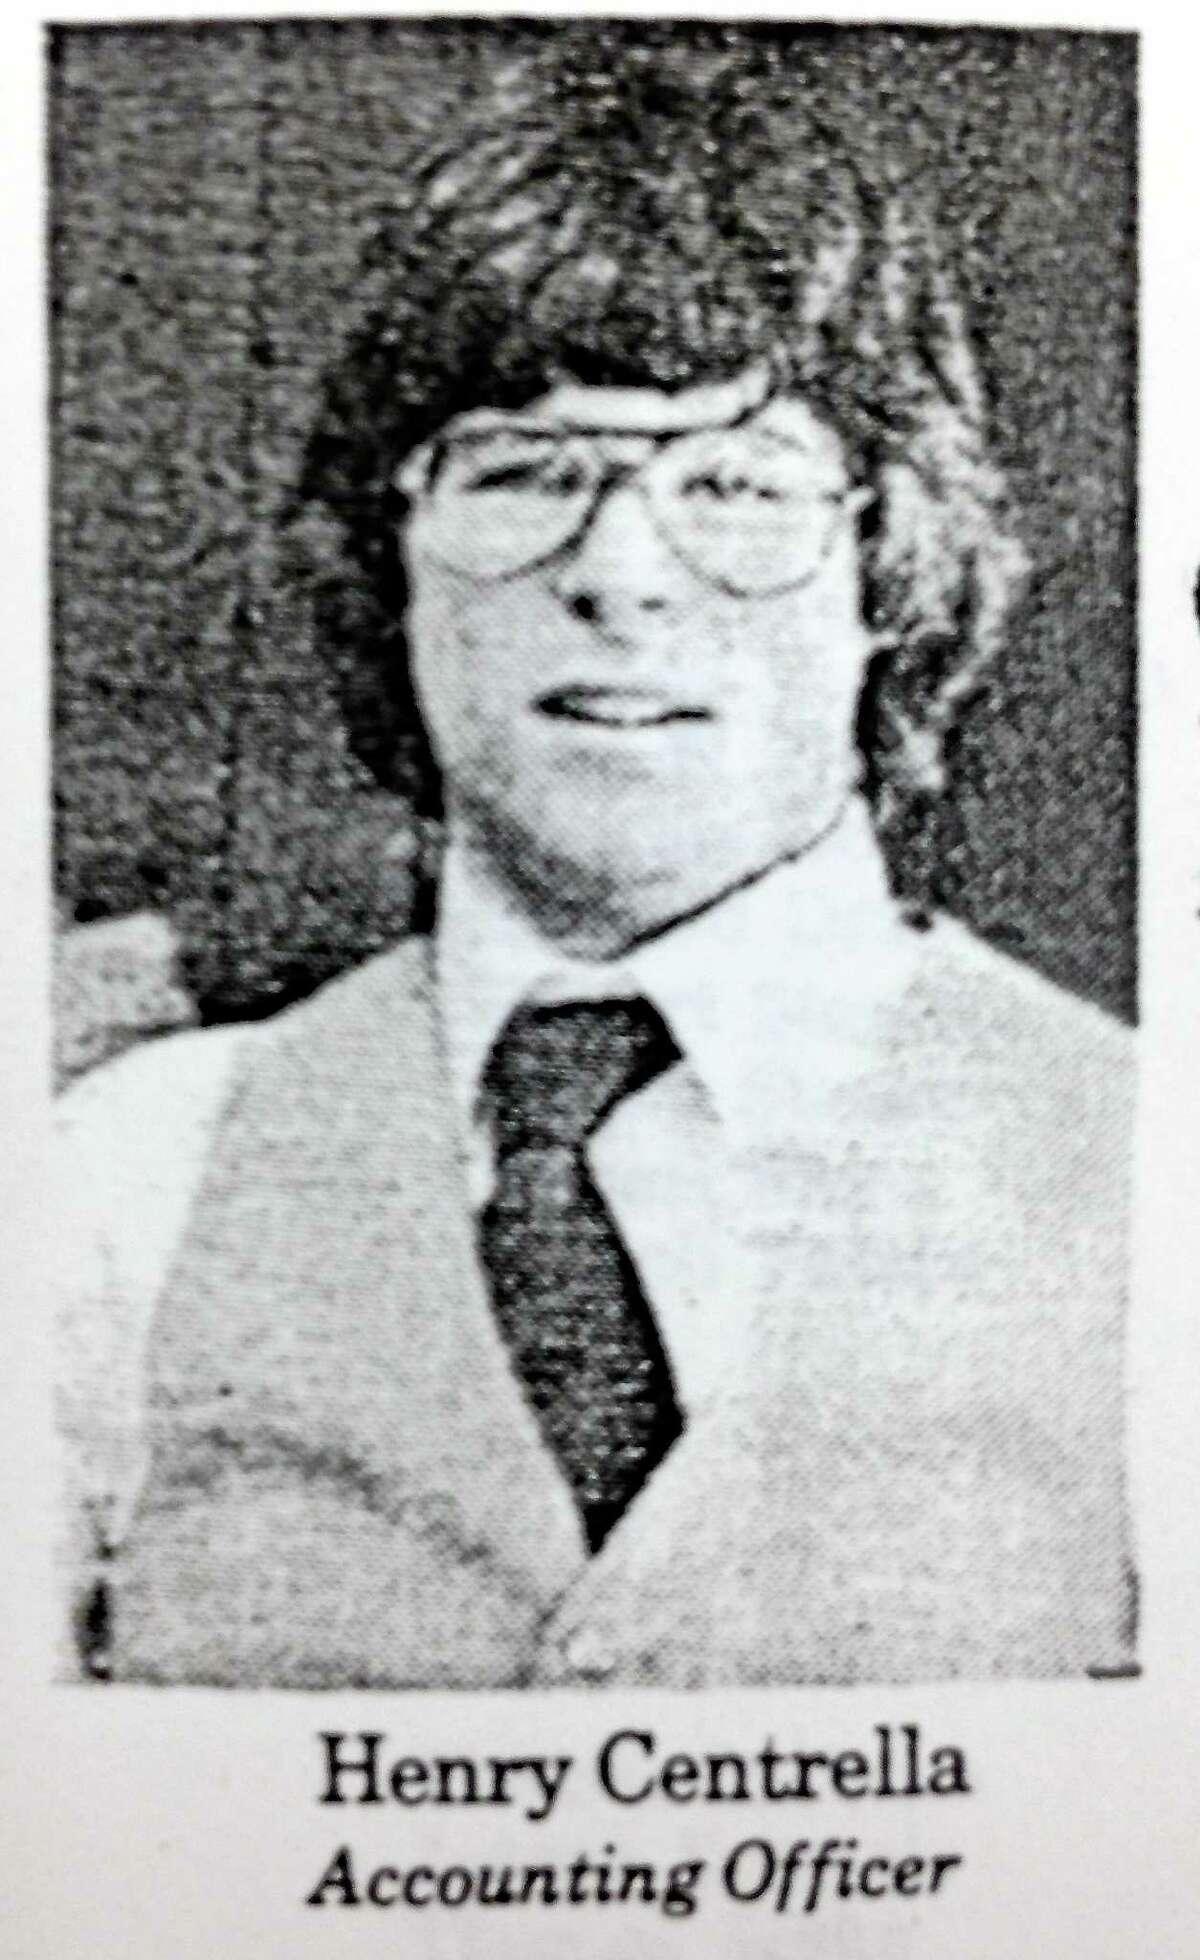 Henry Centrella, 1978